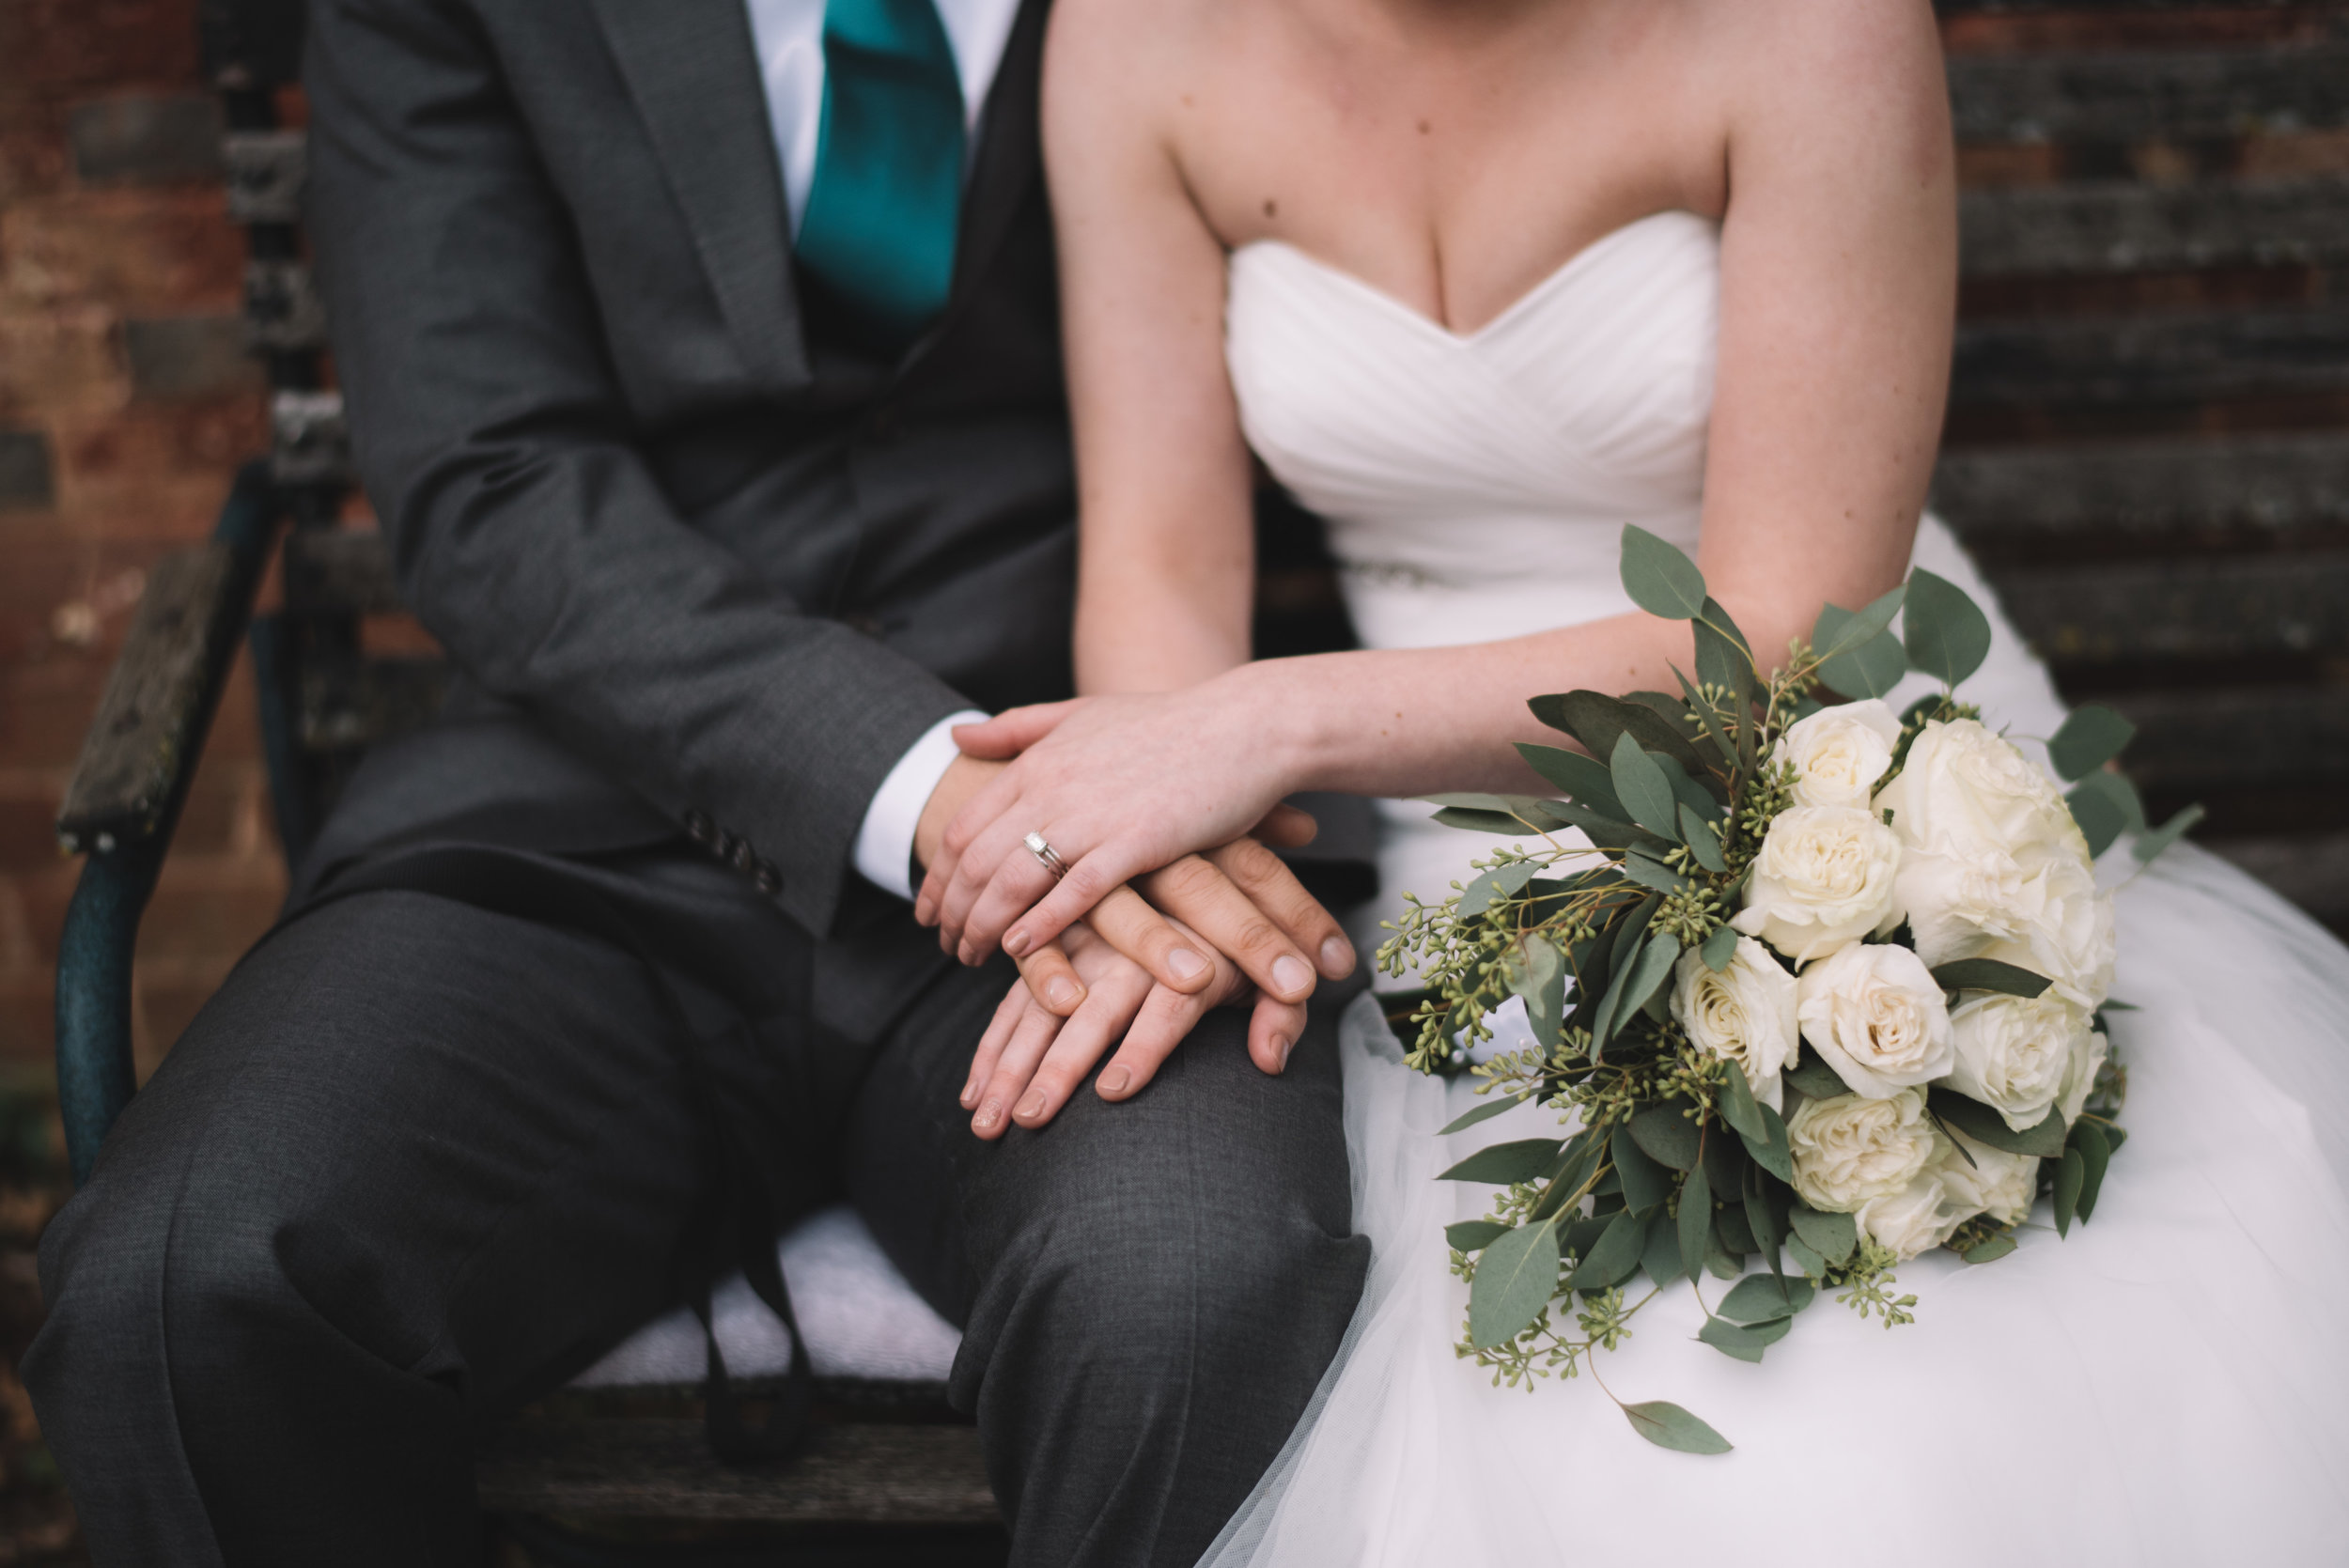 WeddingPhotos | NJPhotographer | Highlights-10-21.jpg